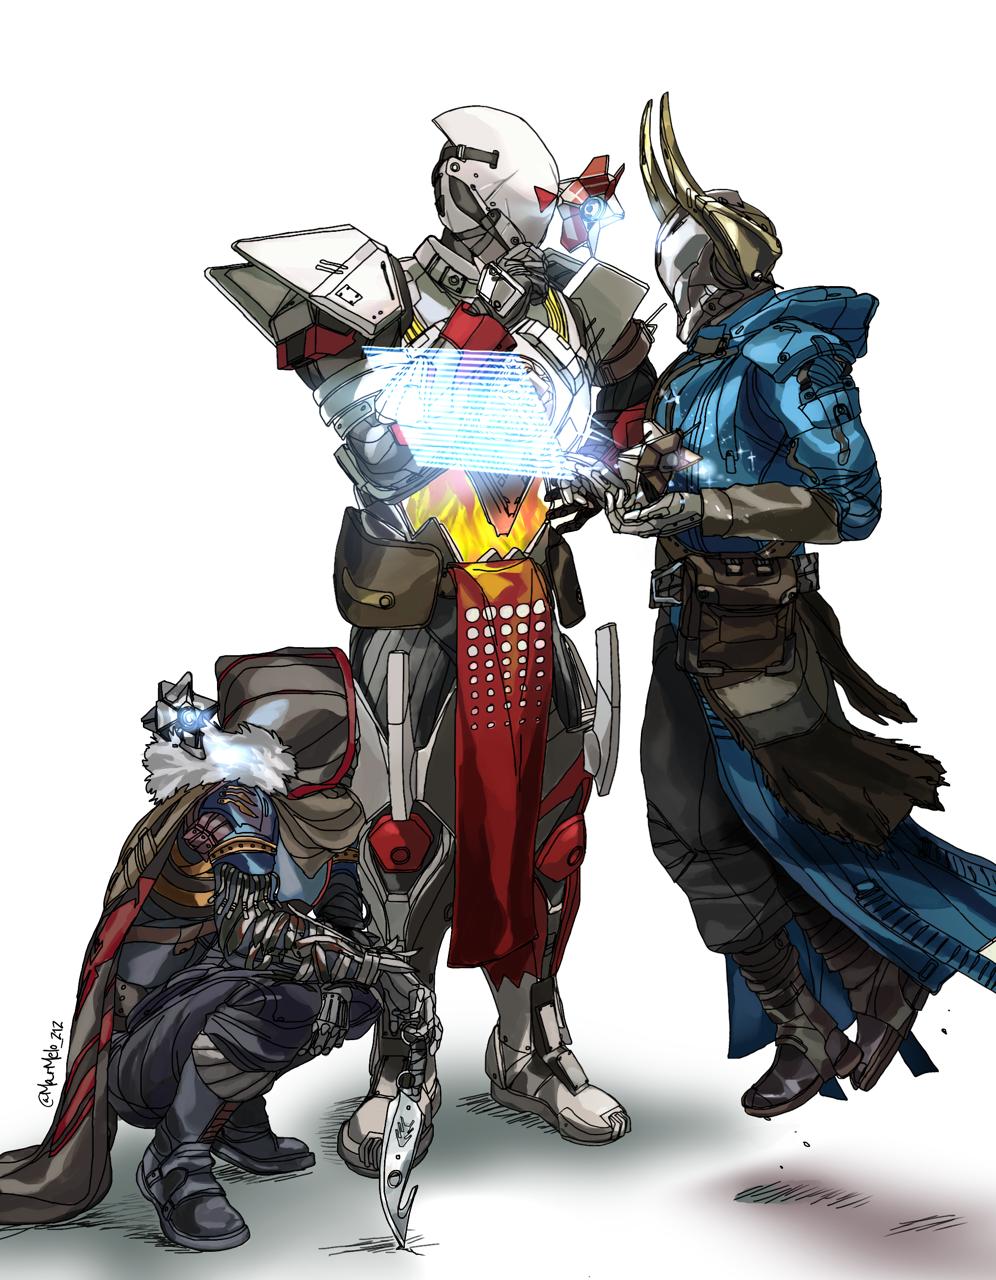 Destiny Destiny 2 Guardian Chill Chilling Hunter Warlock Titan Ghost Team Destiny Comic Destiny Cosplay Destiny Hunter